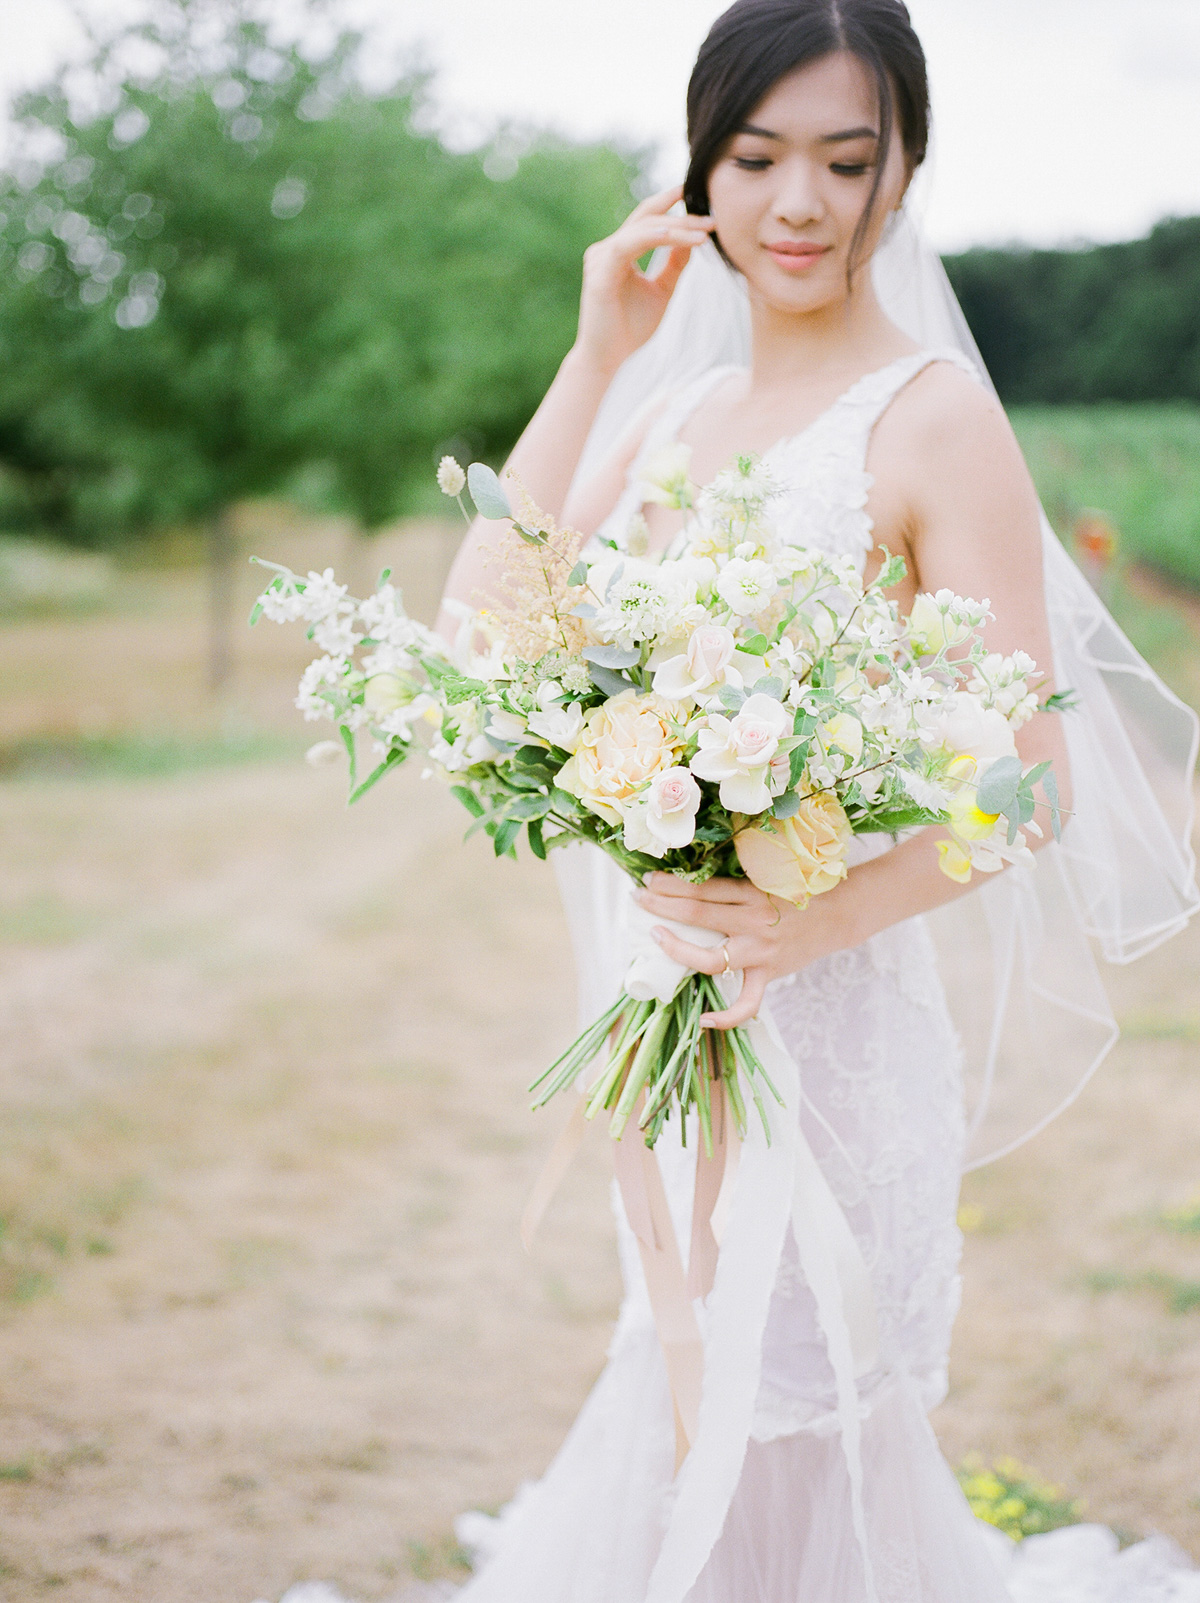 jennifer-xu-photography-vineyard-bride-swish-list-rosewod-eatstes-winery-beamsville-wedding-editorial-35.jpg